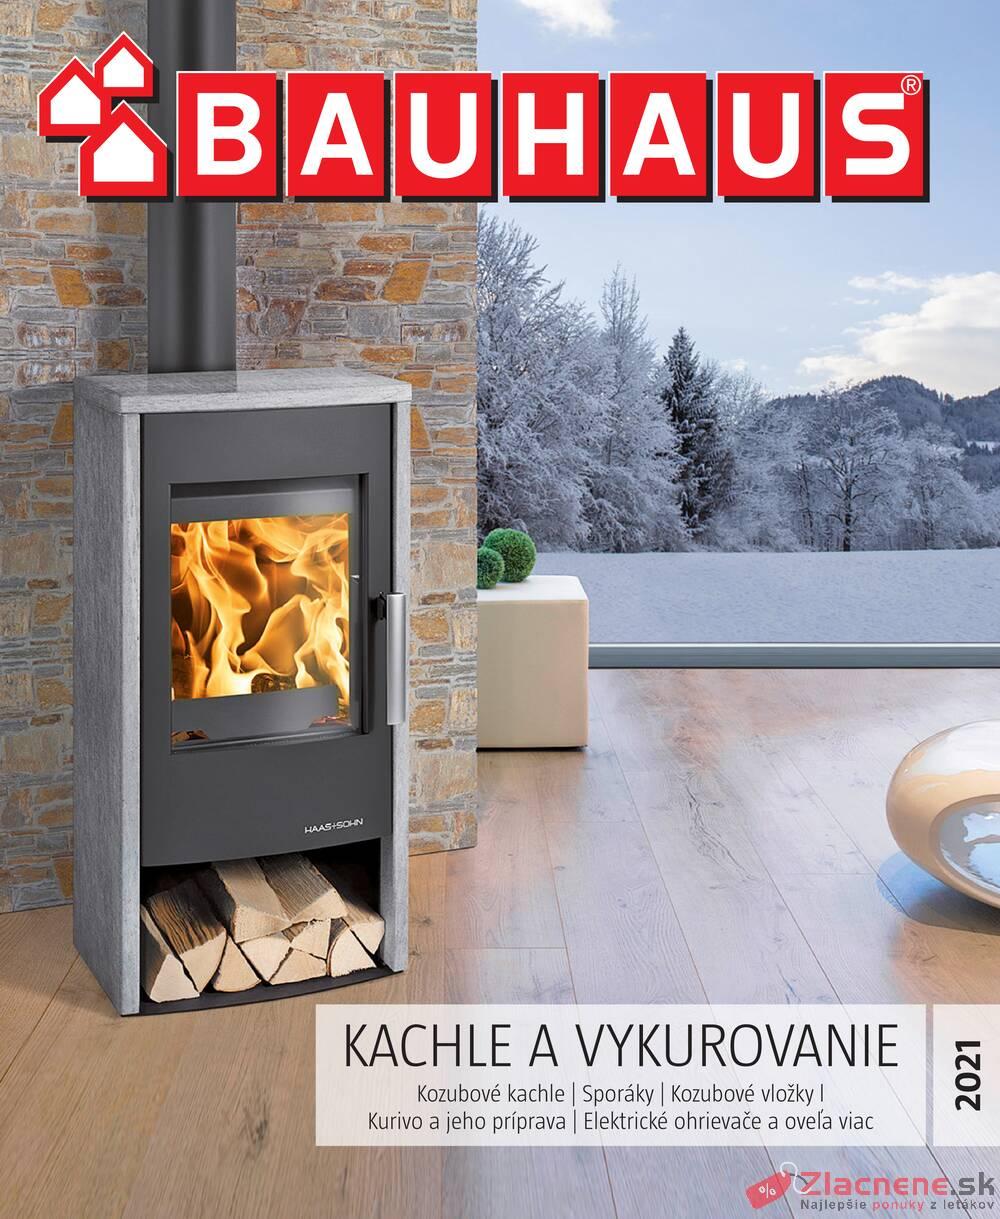 Leták Bauhaus - Bauhaus KACHLE A VYKUROVANIE 23.8. - 31.12. - strana 1